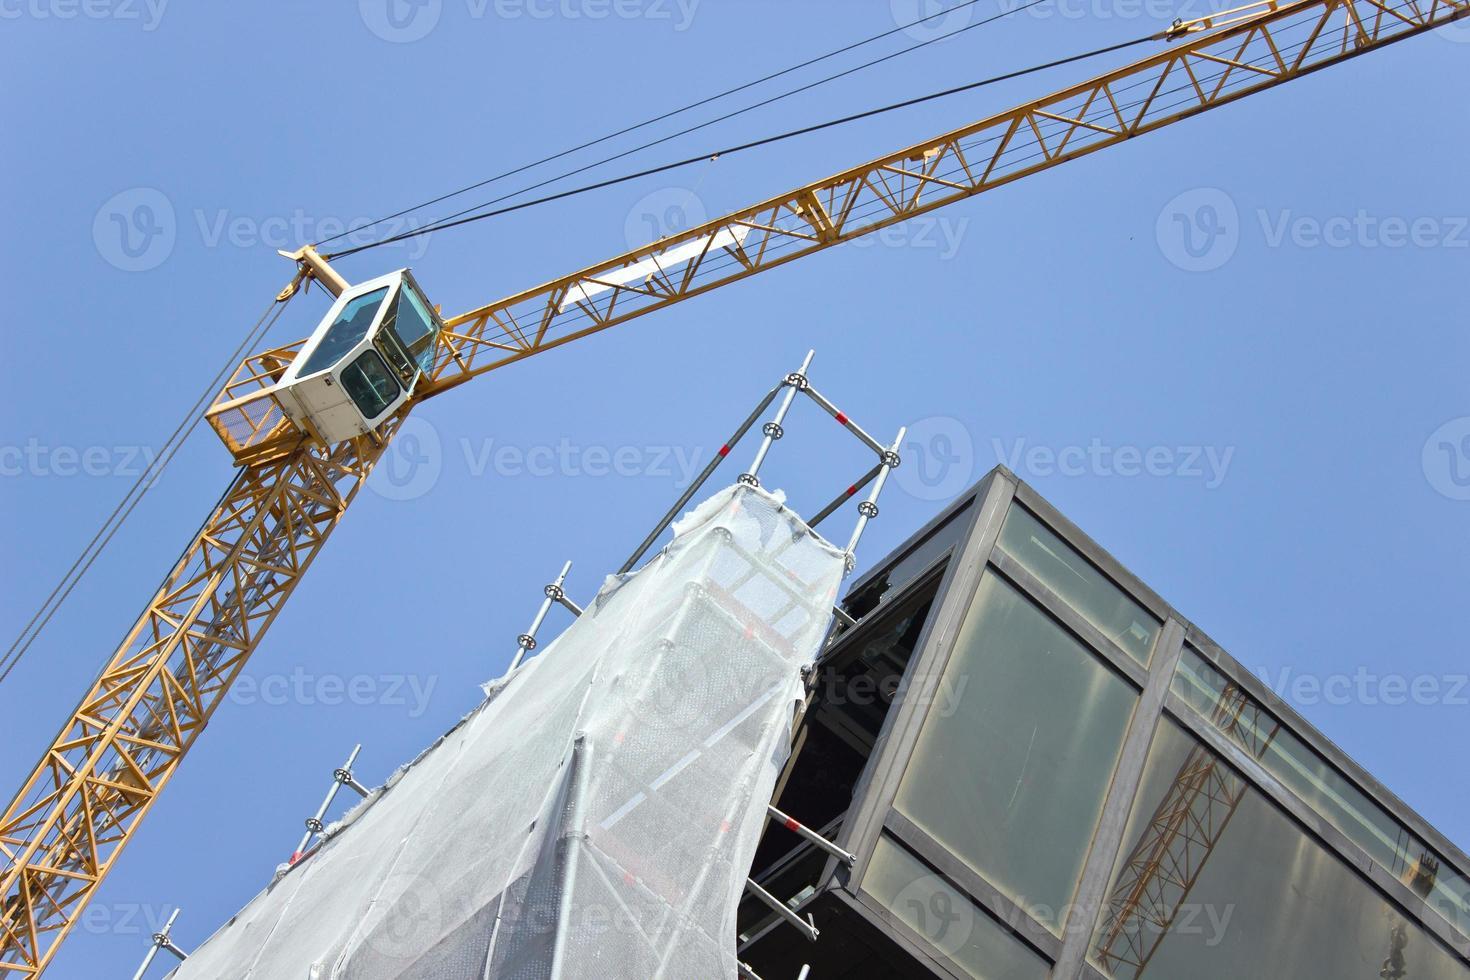 Construction site with cranes against blue sky photo